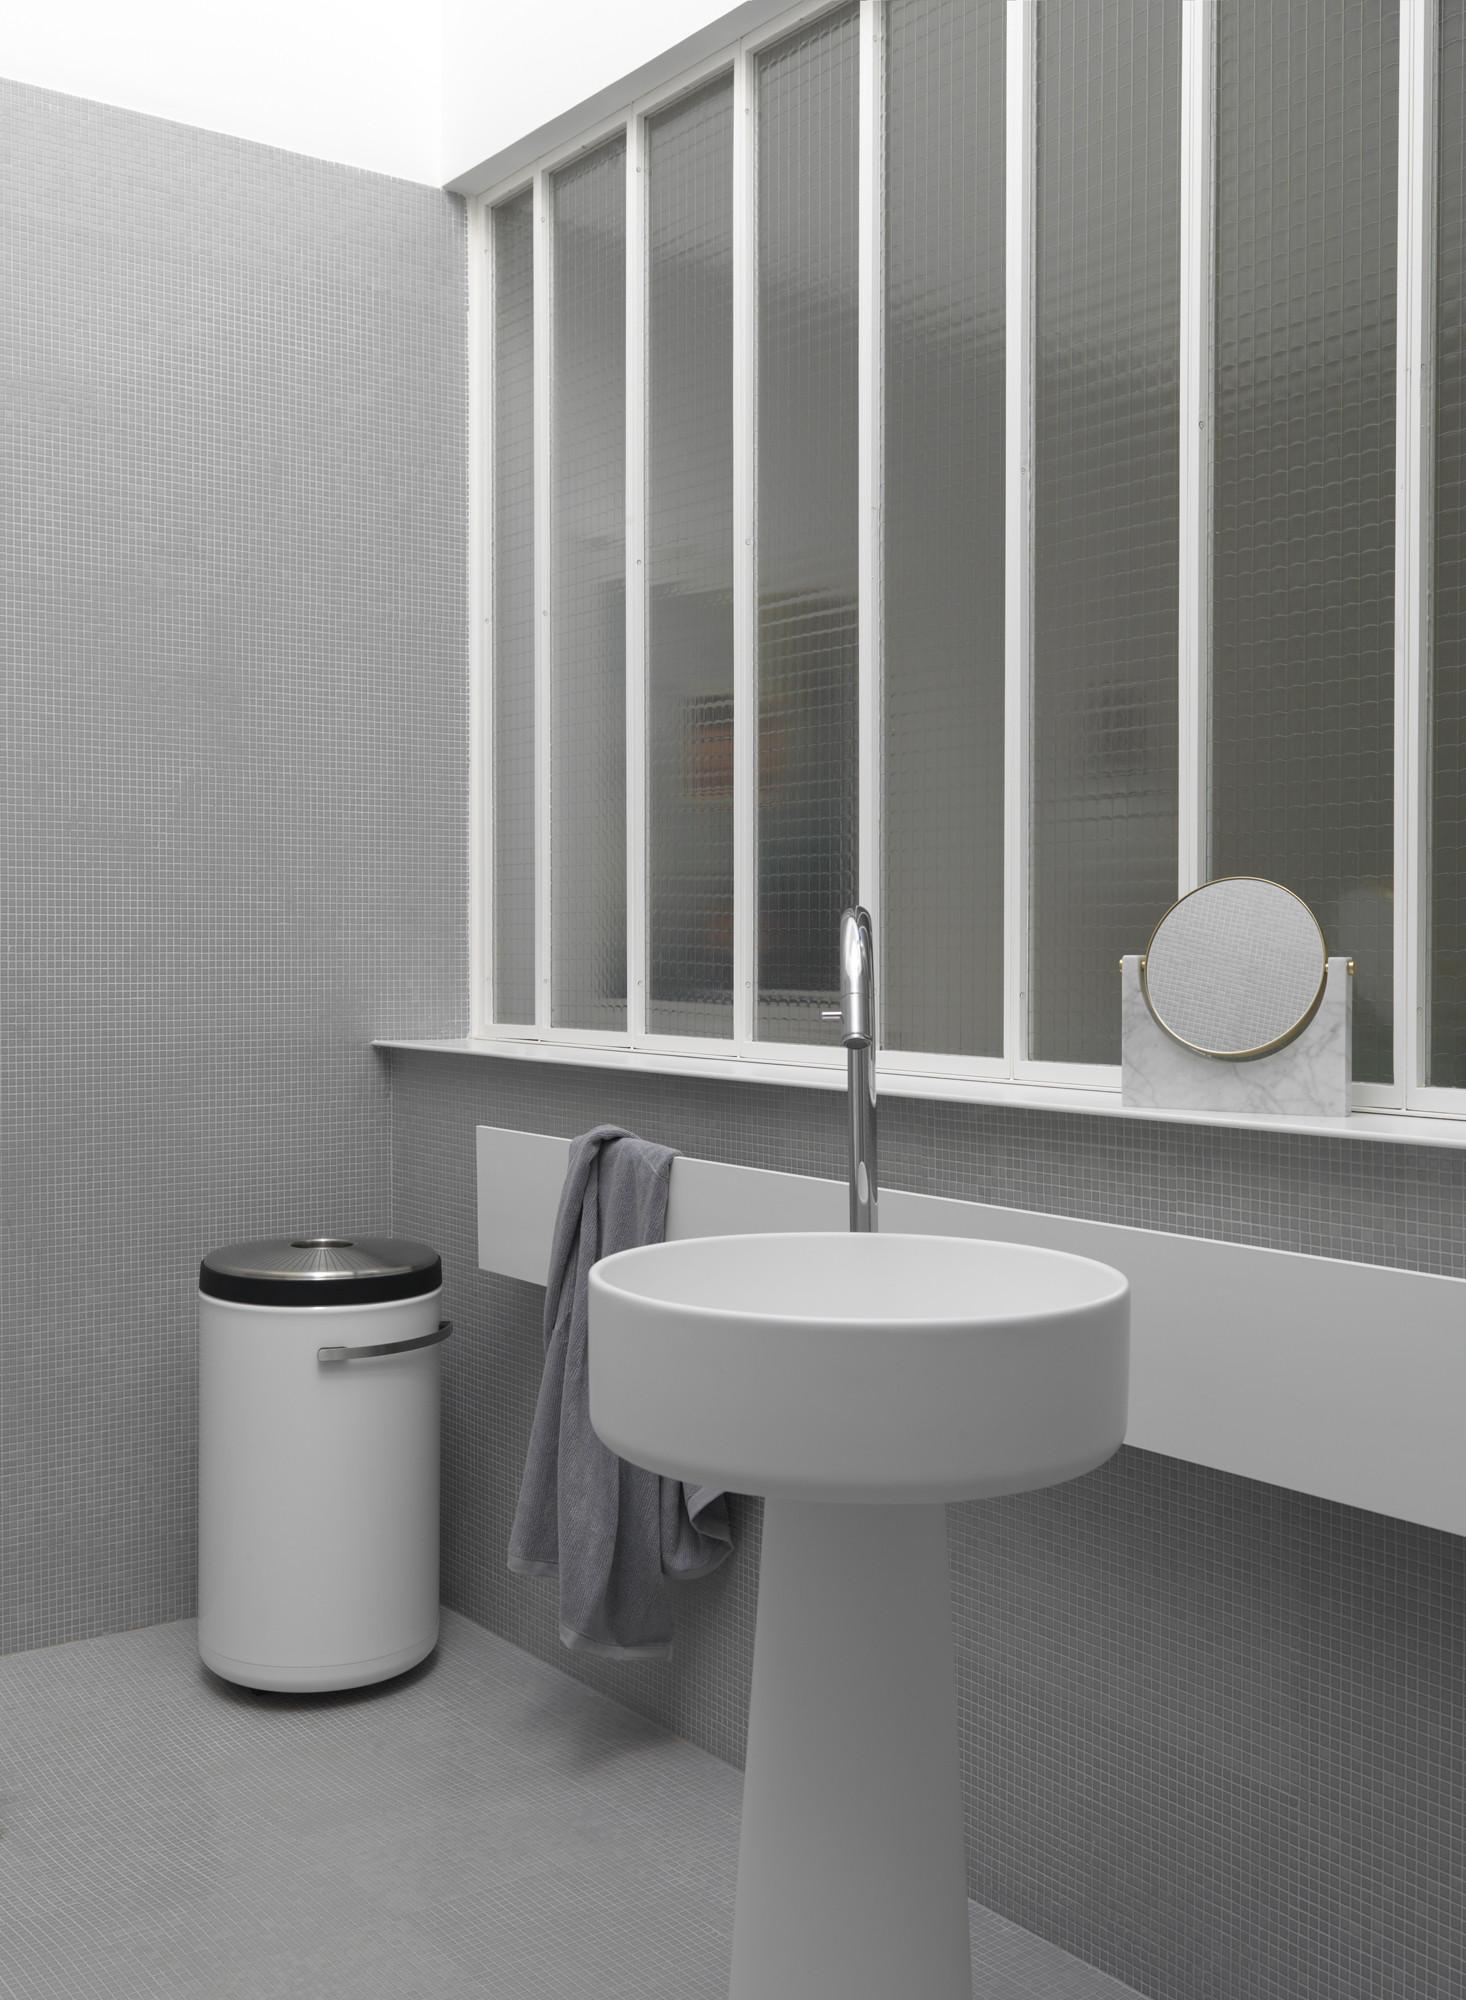 vipp Bath Towel grey VIPP104, 10401, 5705953165961